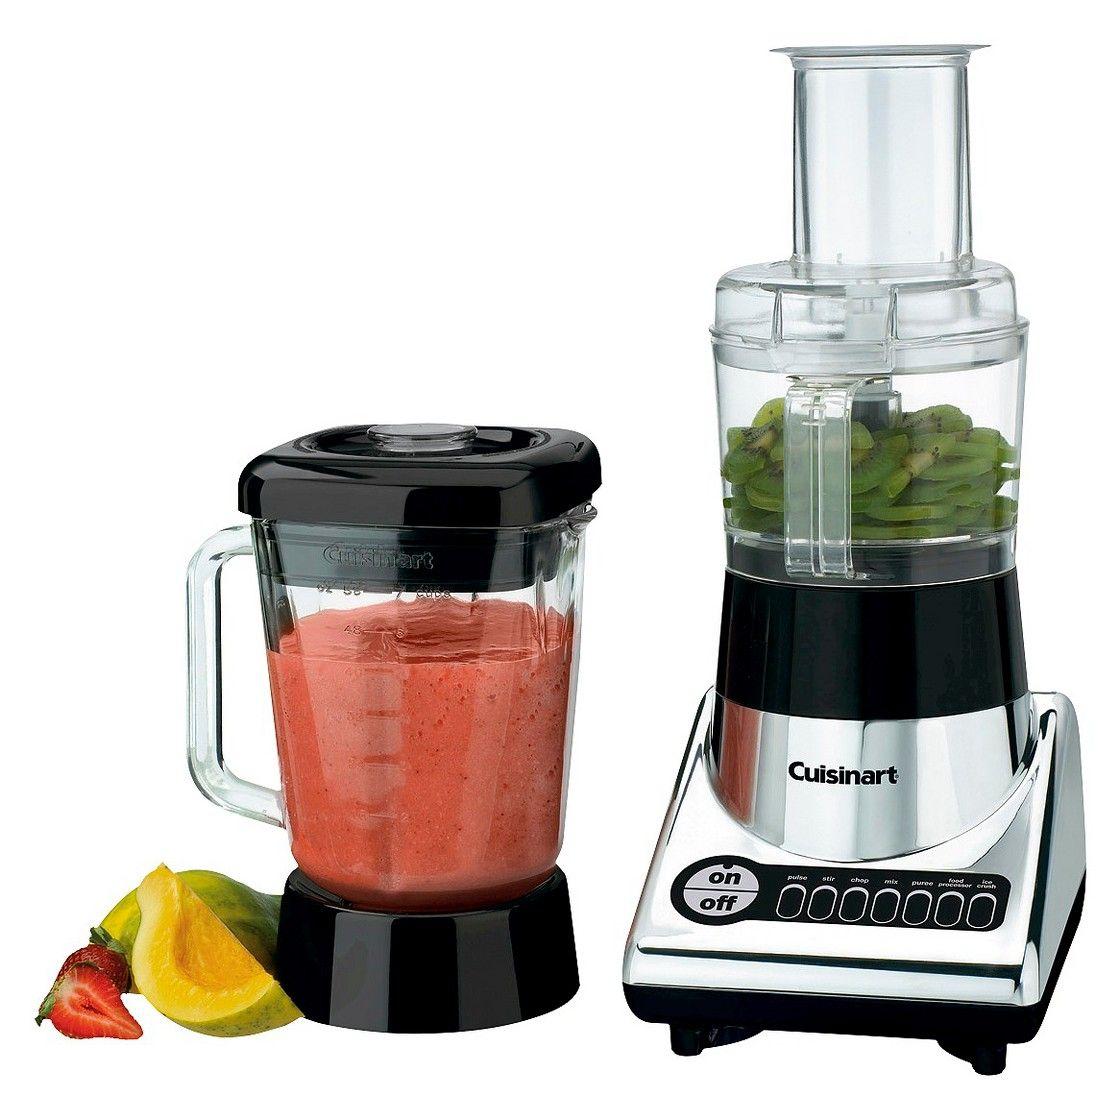 Cuisinart Smartpower Duet Blender Food Processor Bfp 10ch Food Processor Recipes